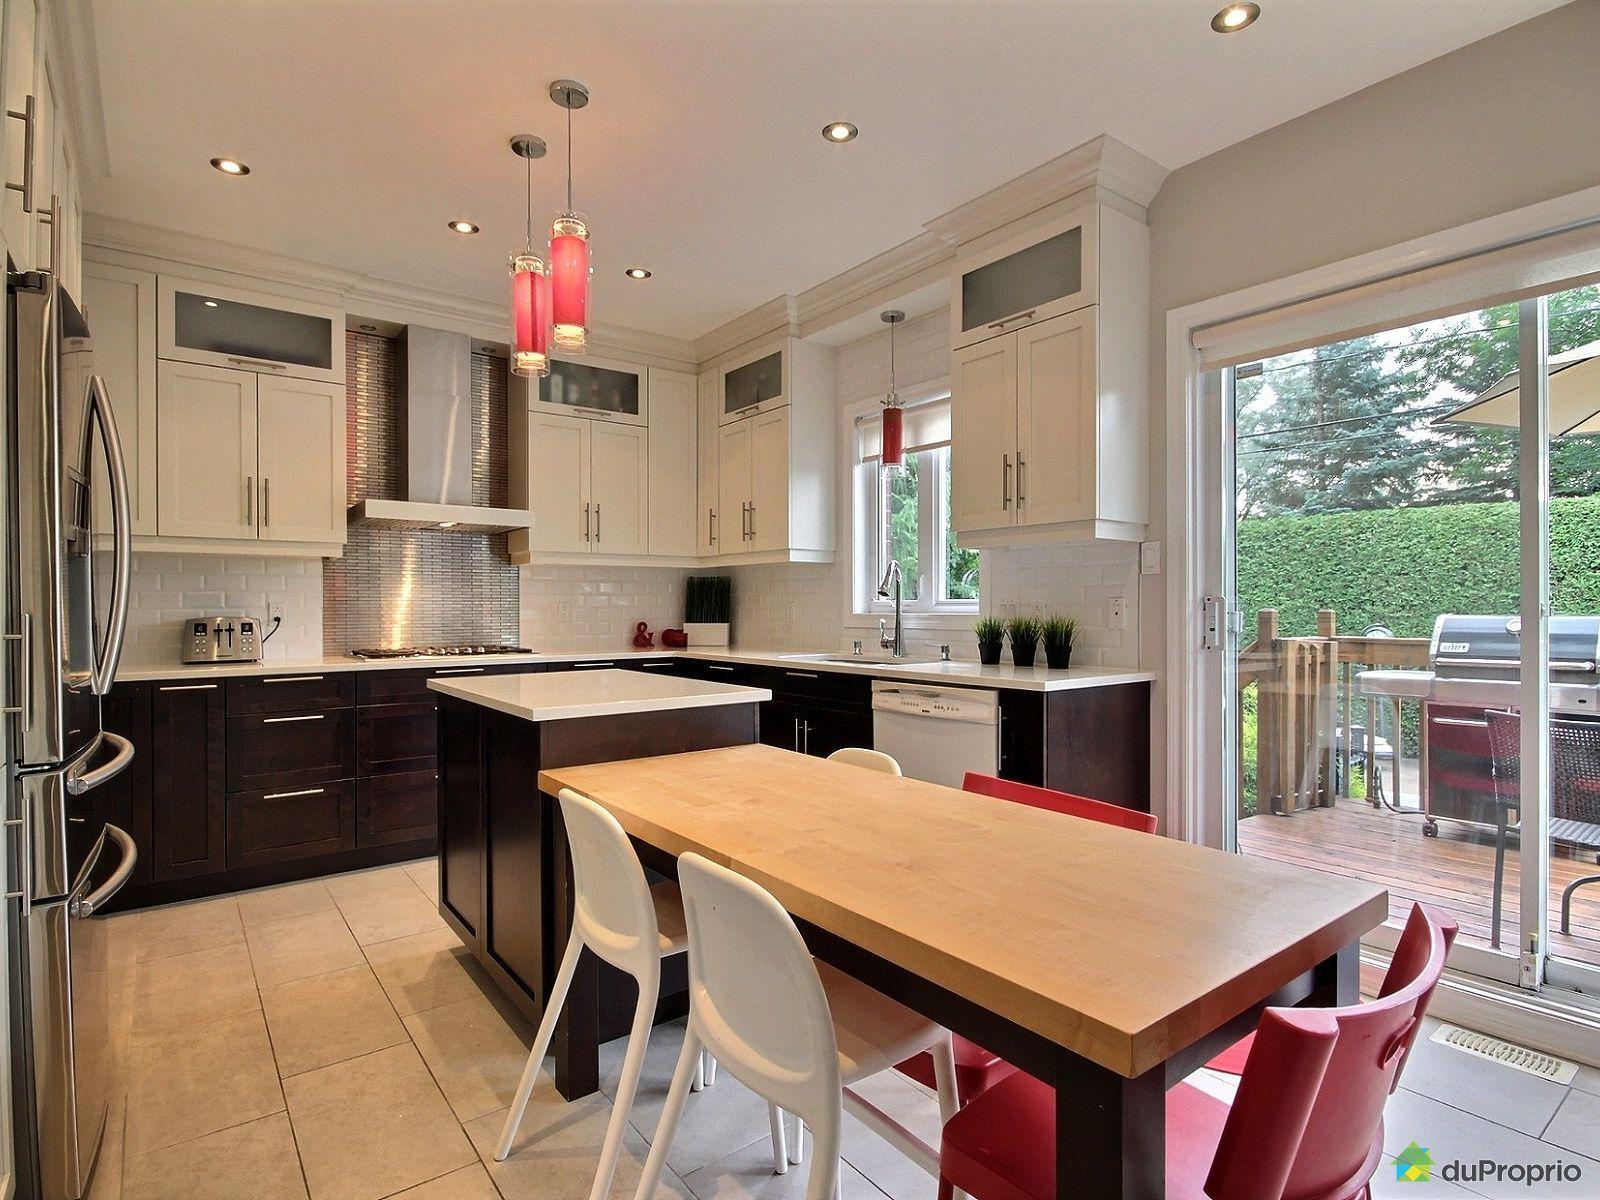 Maison vendre st bruno de montarville 801 rue marie for Ares cuisine st bruno